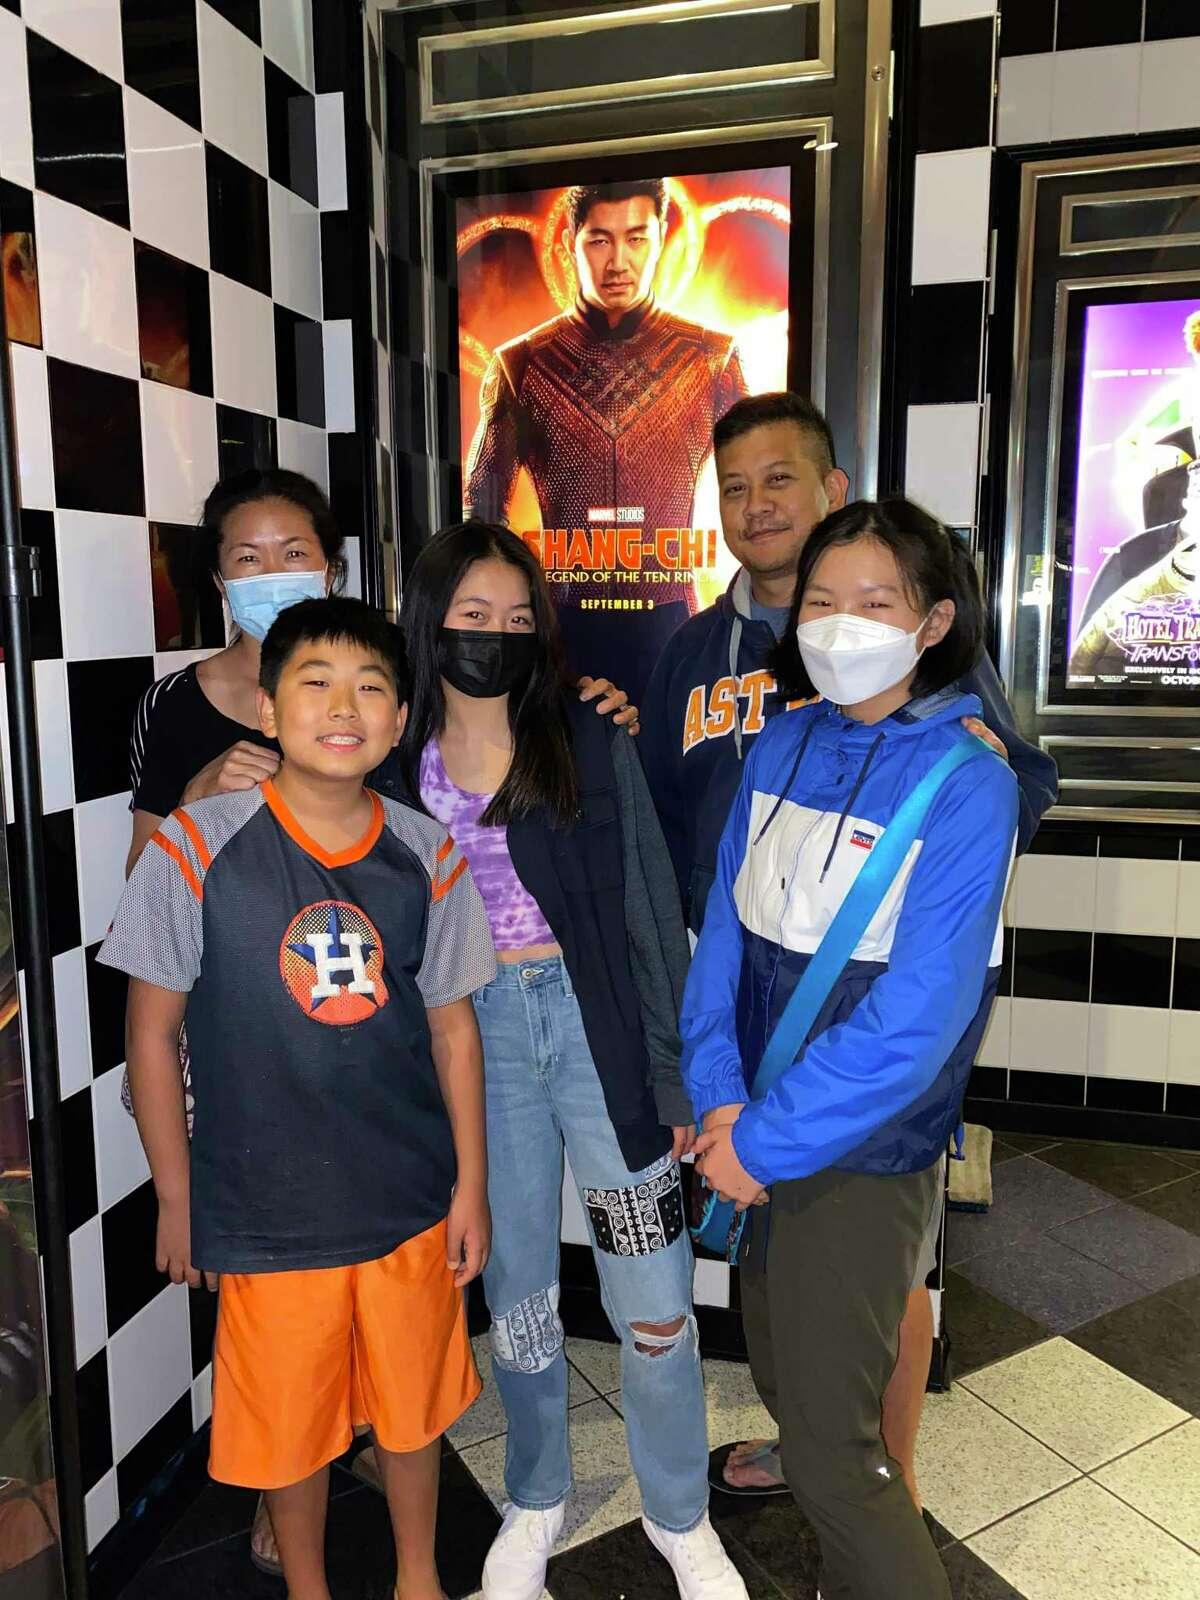 Harold Yi, Christina Yi, Joanne Yi, Eunice Yi, and Joshua Yi pose in front of a movie poster after they saw Shang-Chi.